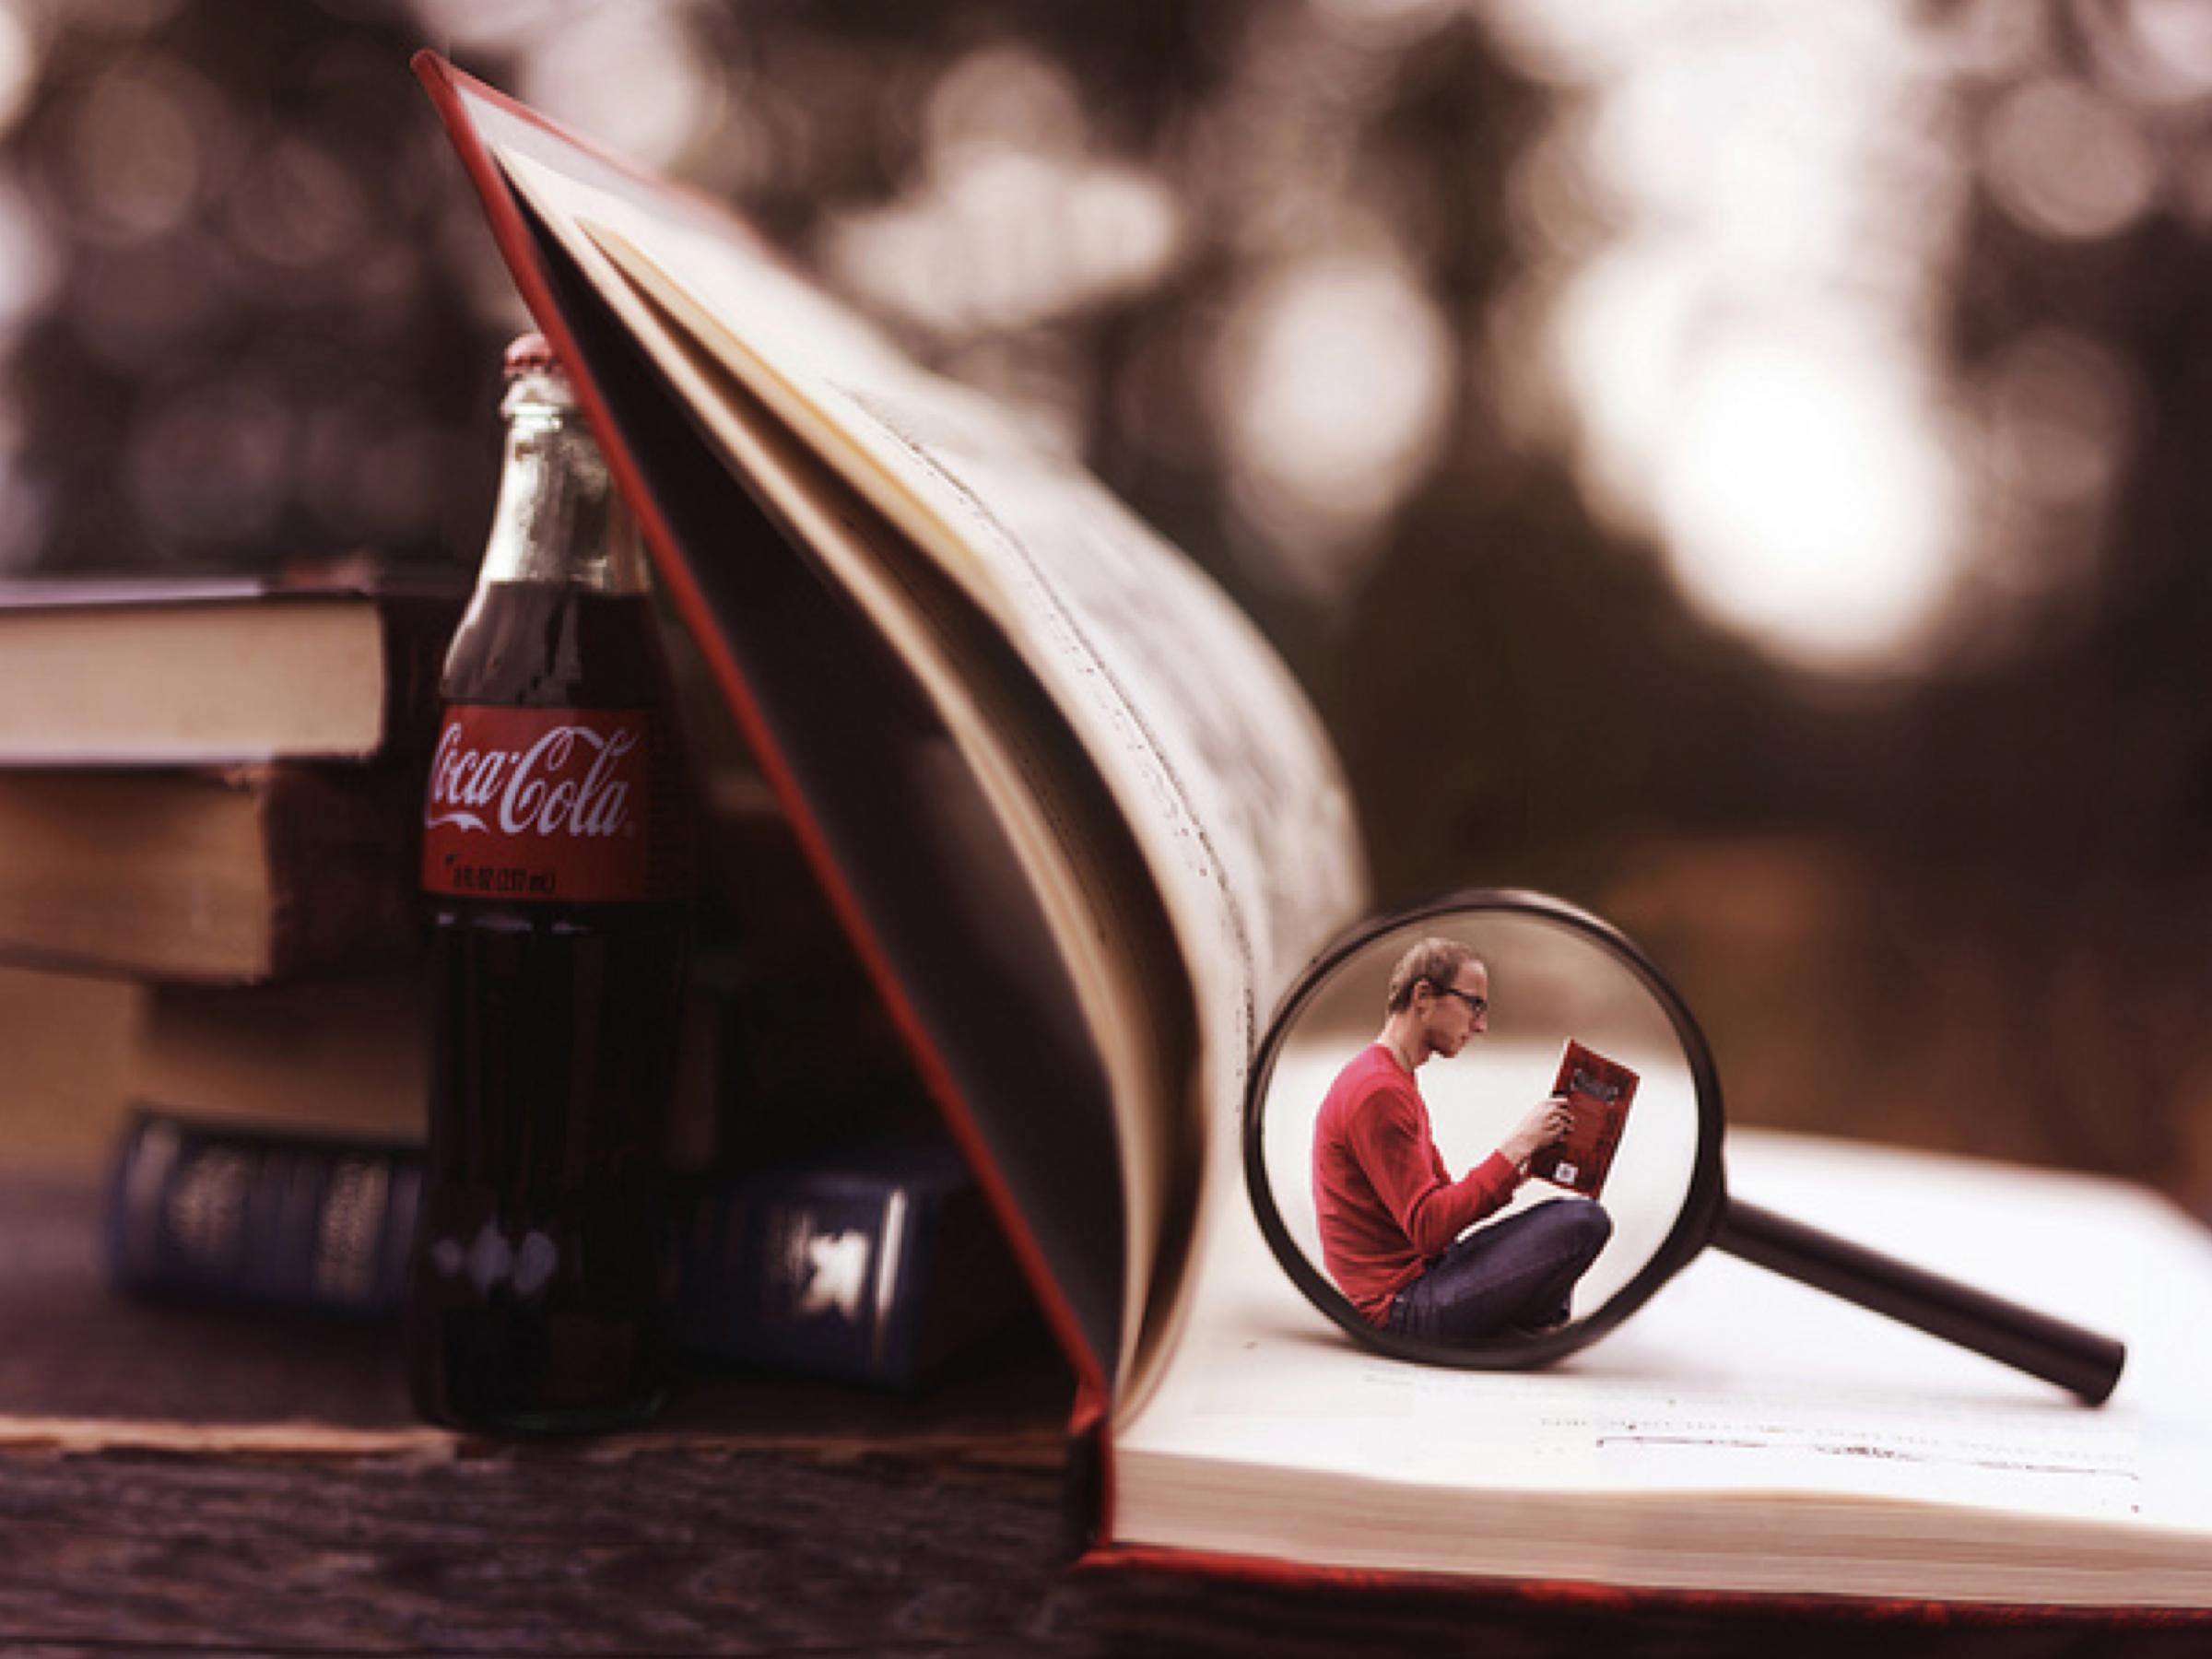 Coke Photographer Inspiration